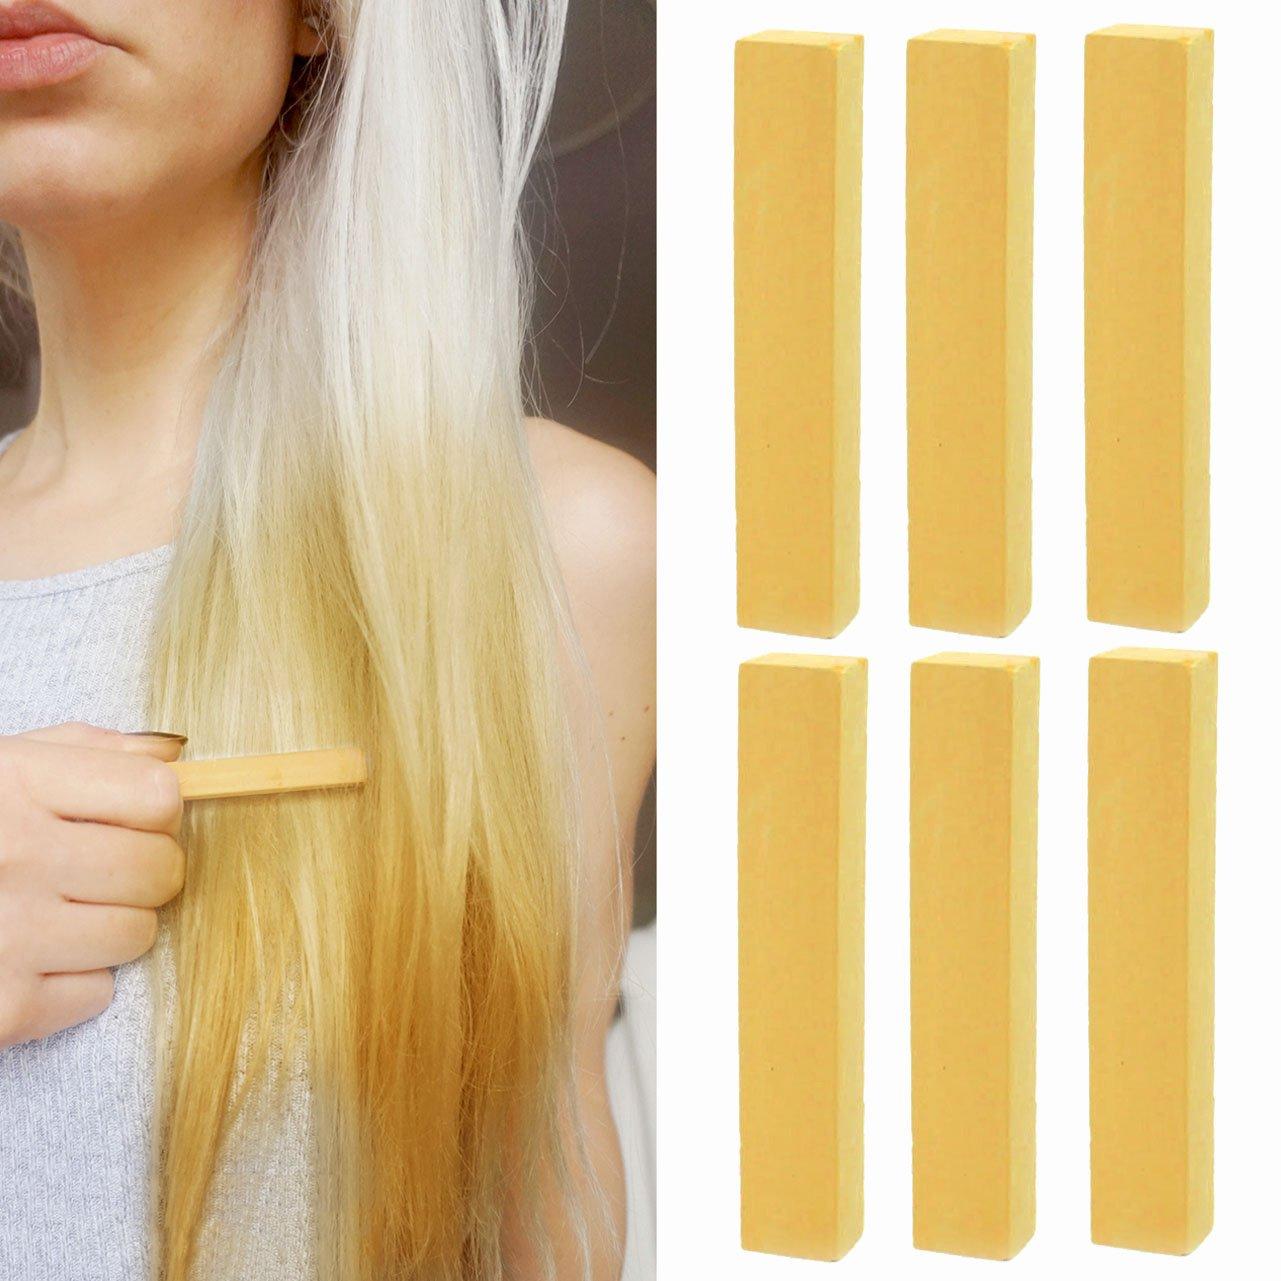 Amazon Best Temporary Golden Blonde Hair Dye Blonde Ombre